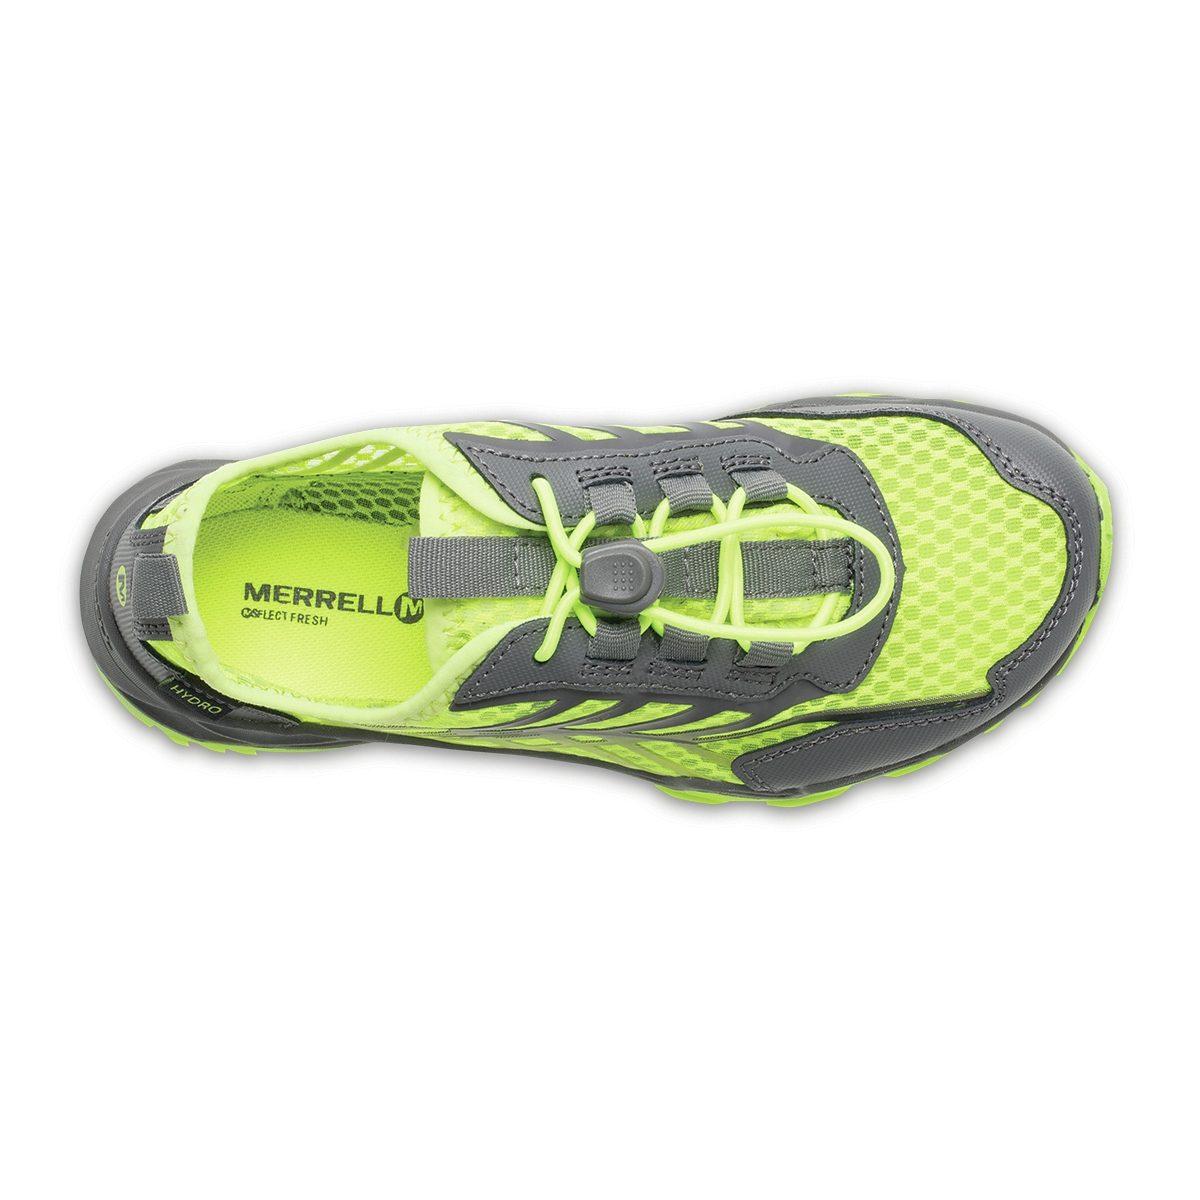 Merrell Halbschuhe »Hydro Run Shoes Kids«